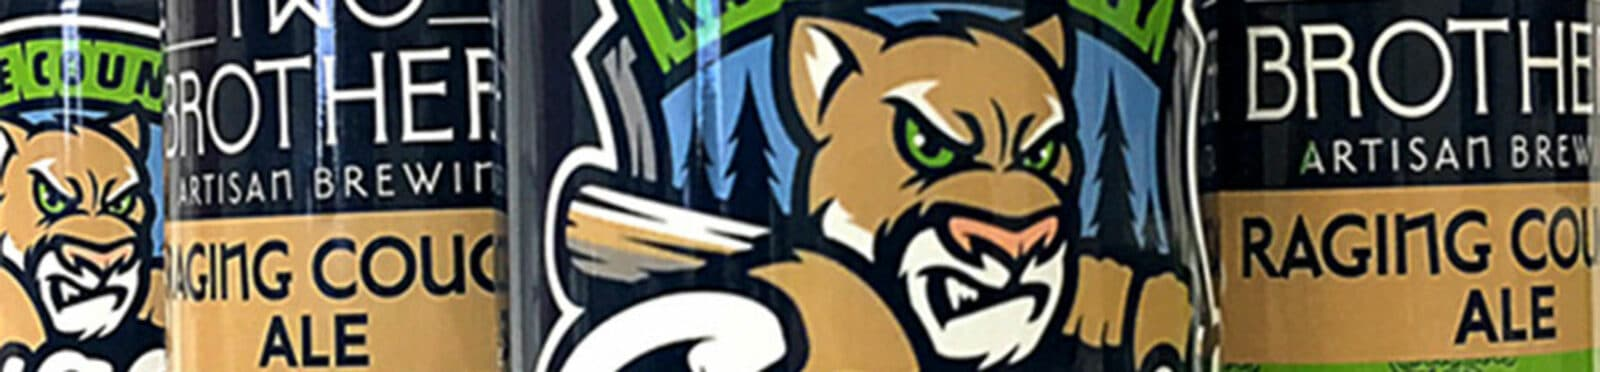 Raging Cougar American Pale Ale header